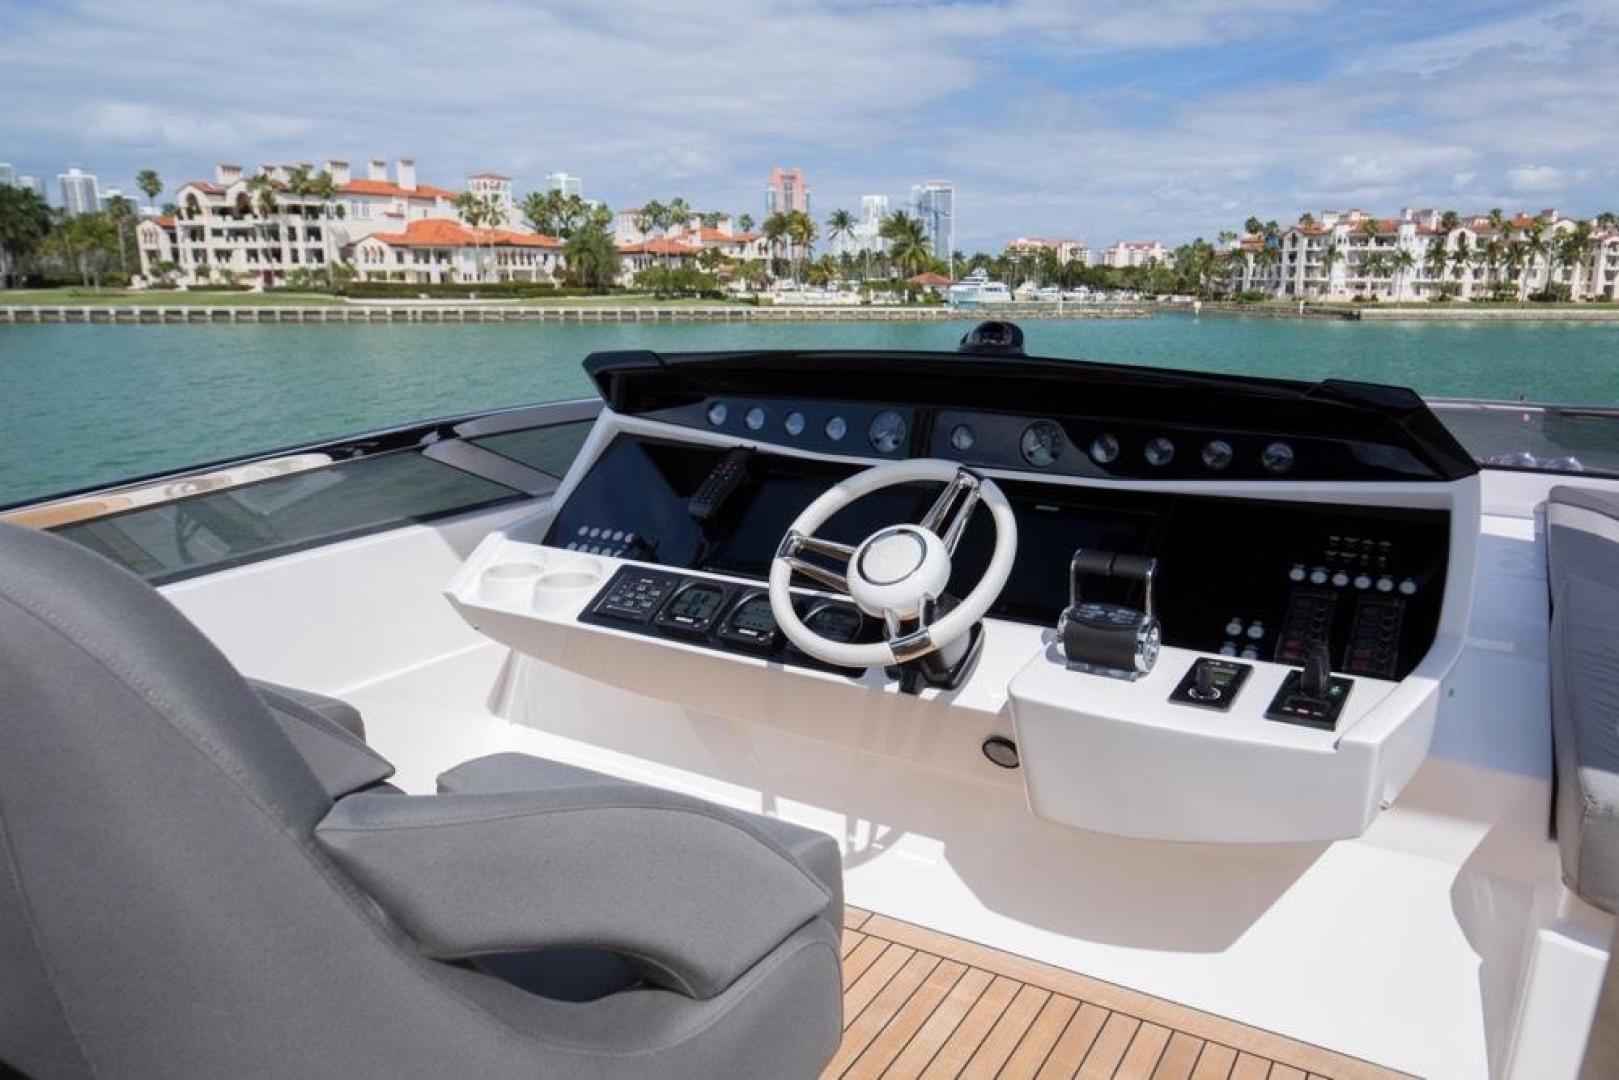 Sunseeker-28 Metre Yacht 2016-RIII Miami-Florida-United States-600124 | Thumbnail